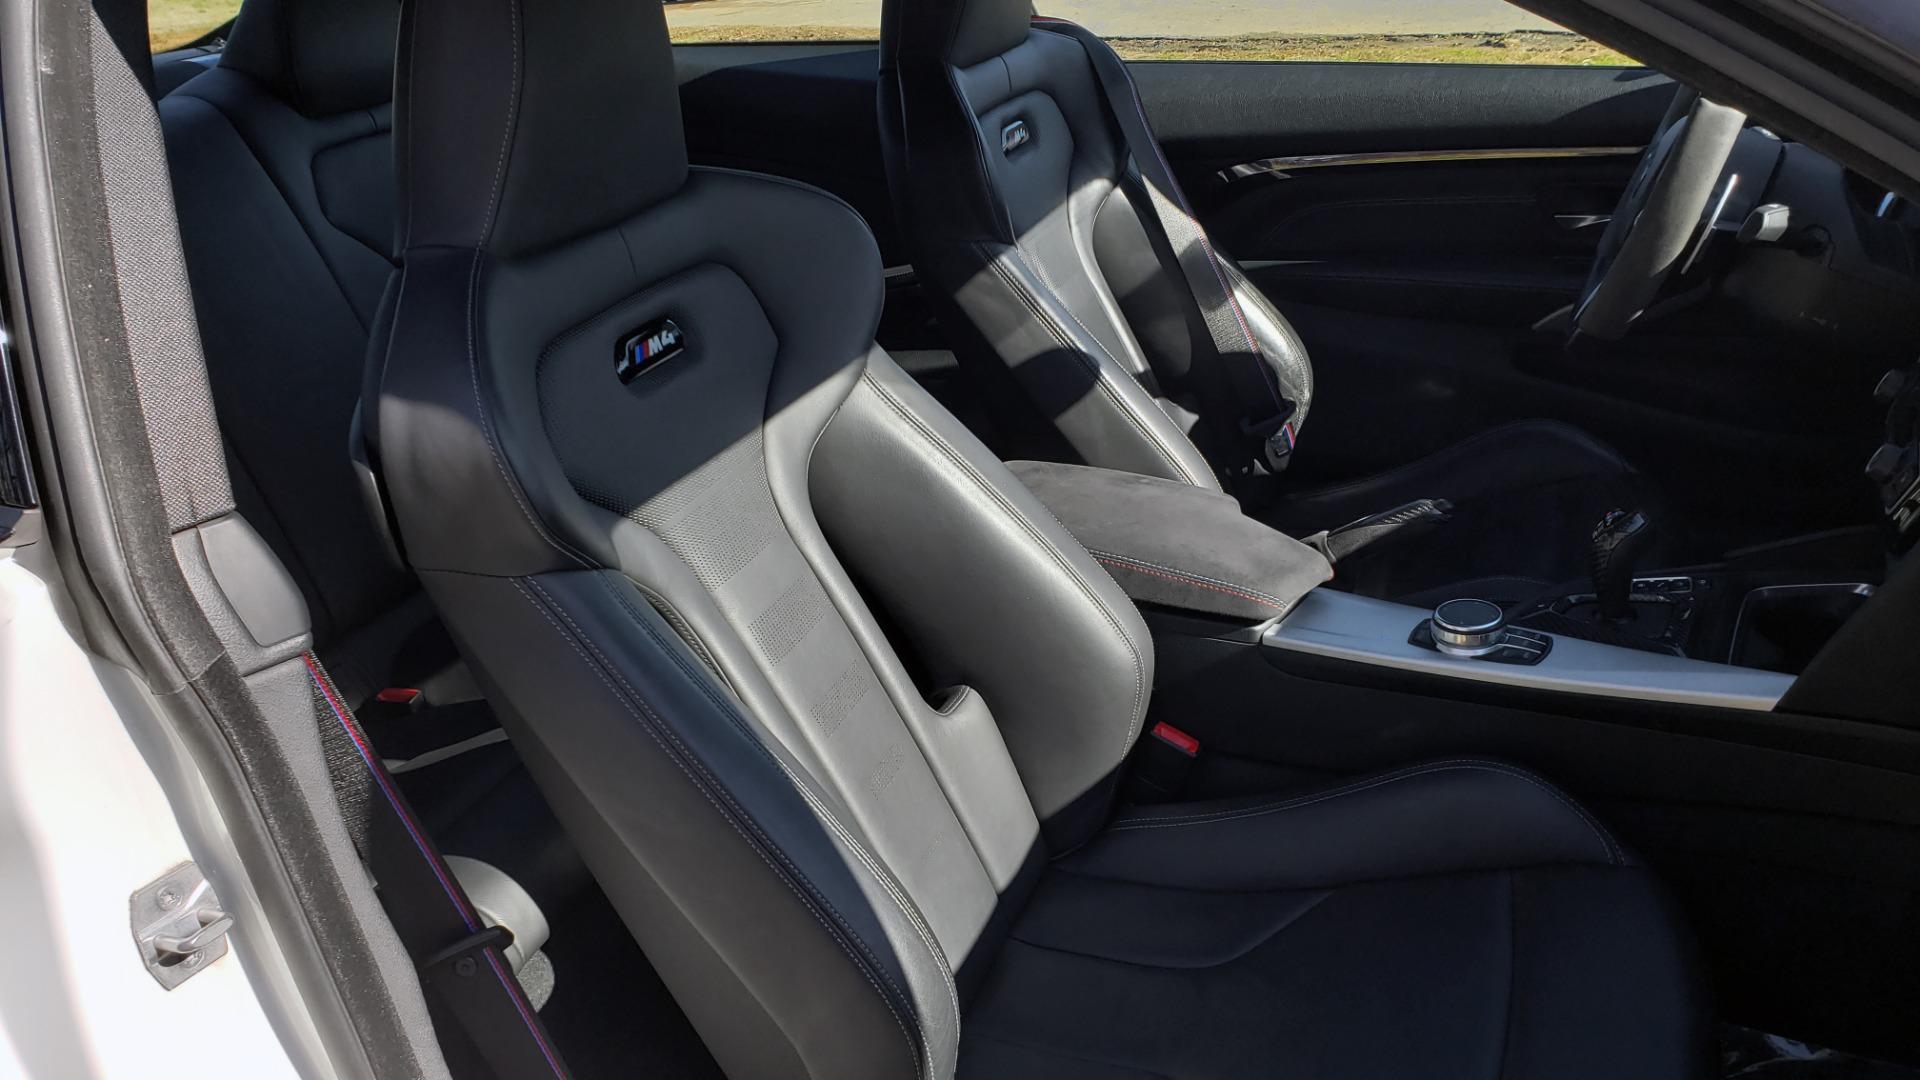 Used 2018 BMW M4 COMP PKG / EXEC / M-DRIVER / PARK CNTRL / ACTIVE BLIND SPOT for sale $45,449 at Formula Imports in Charlotte NC 28227 68